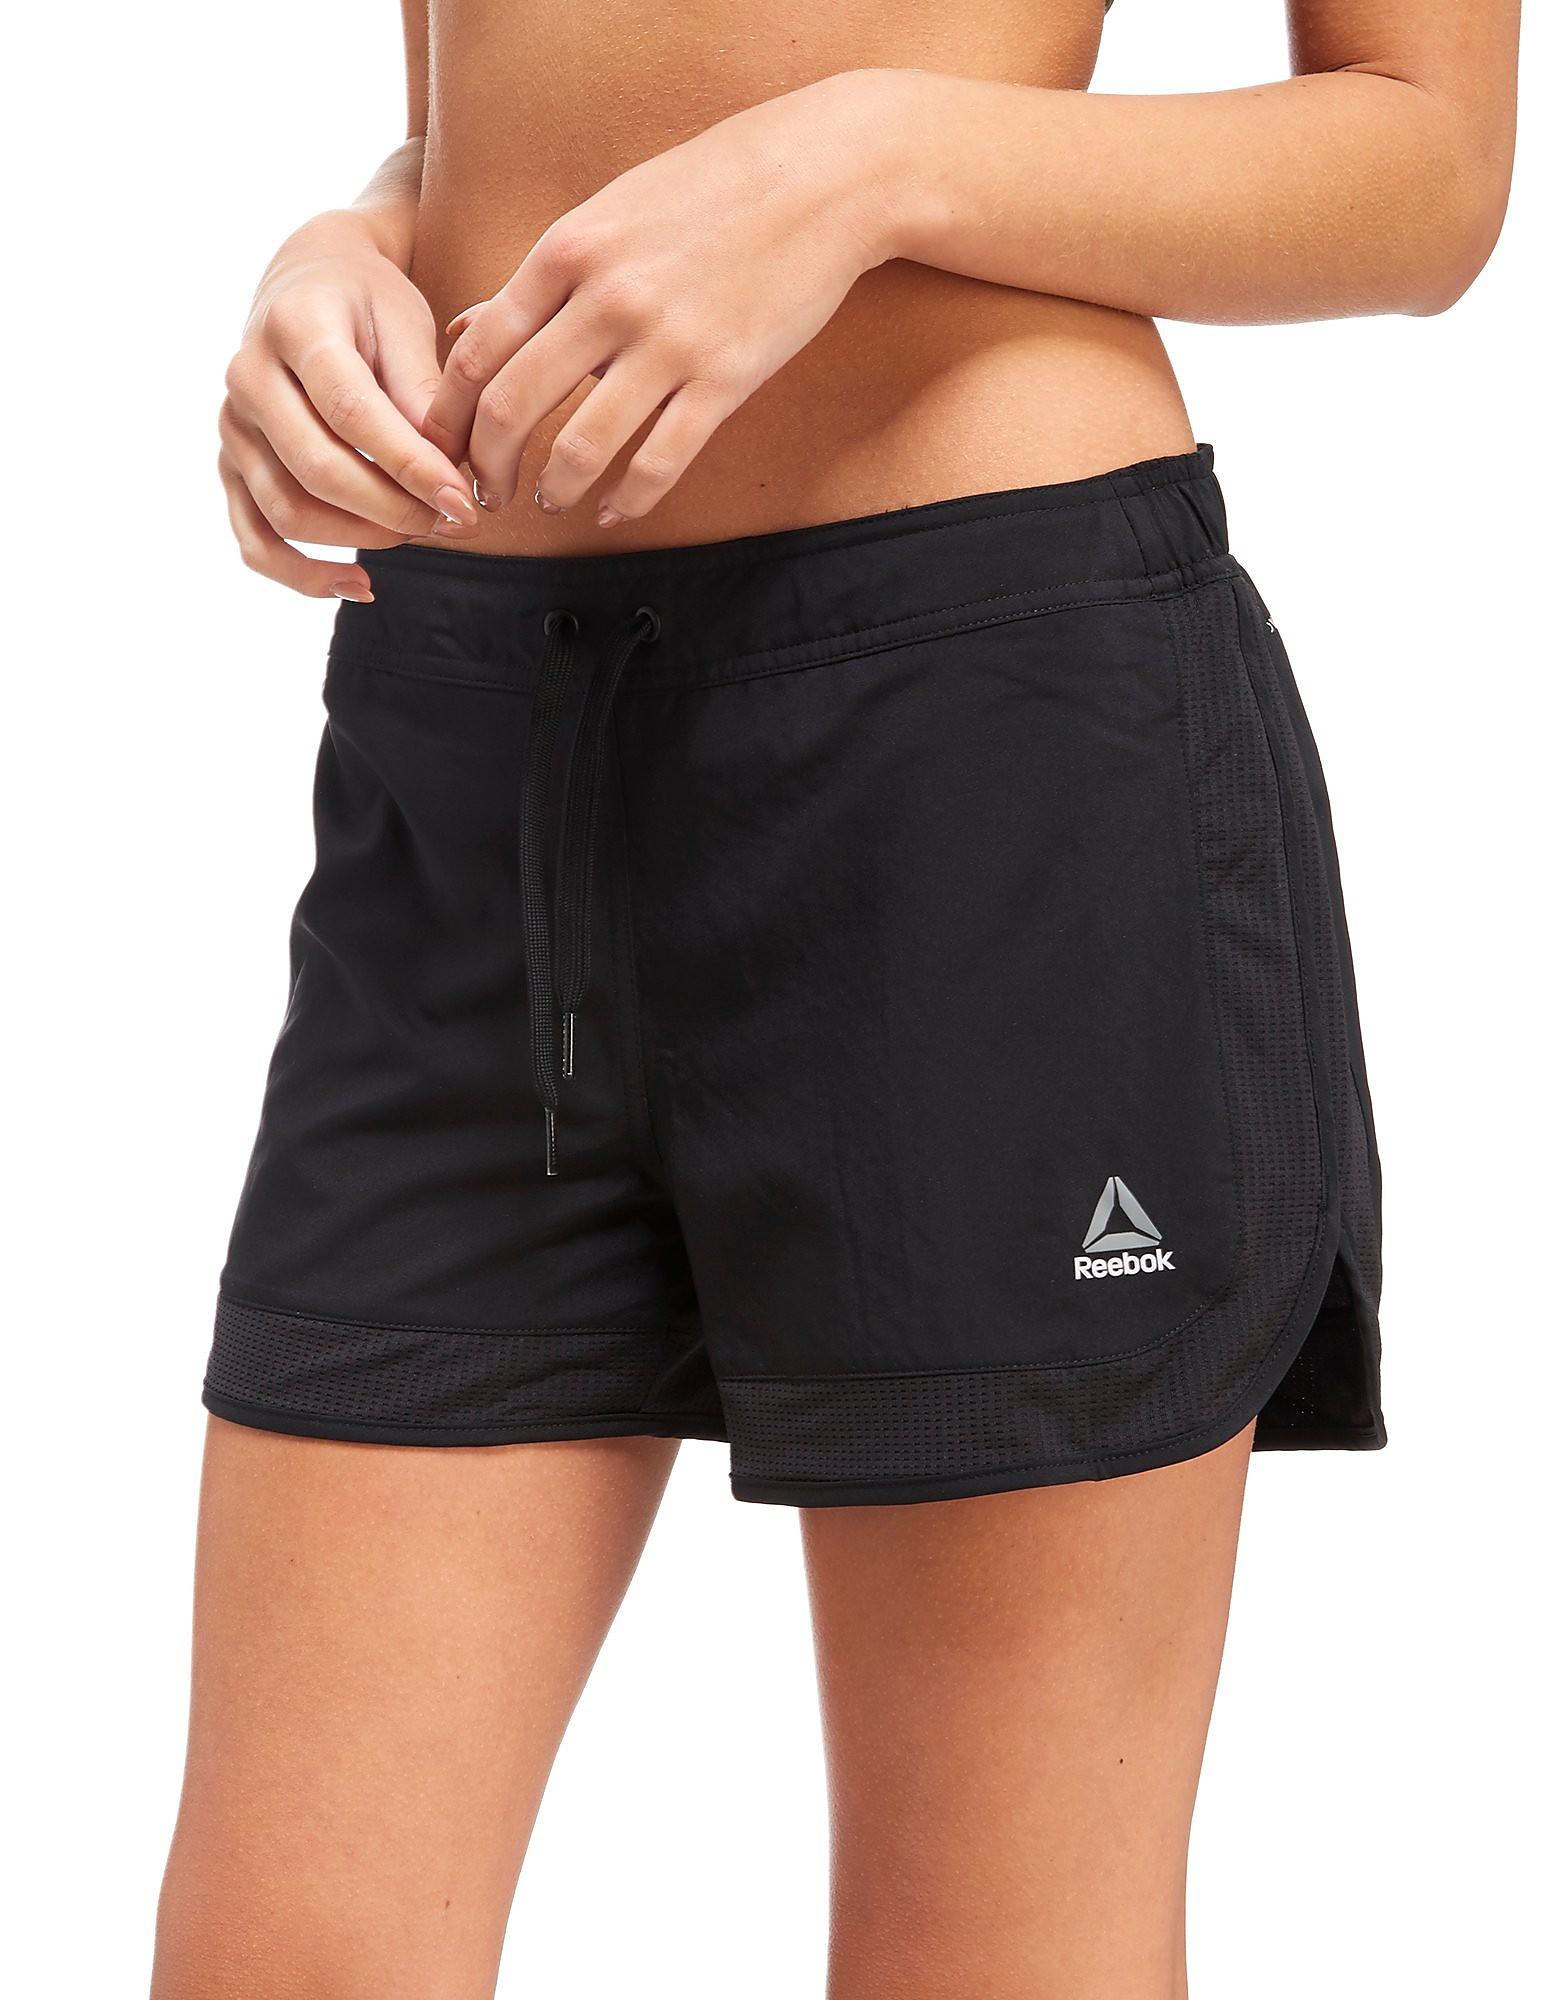 Reebok Woven Mesh Shorts